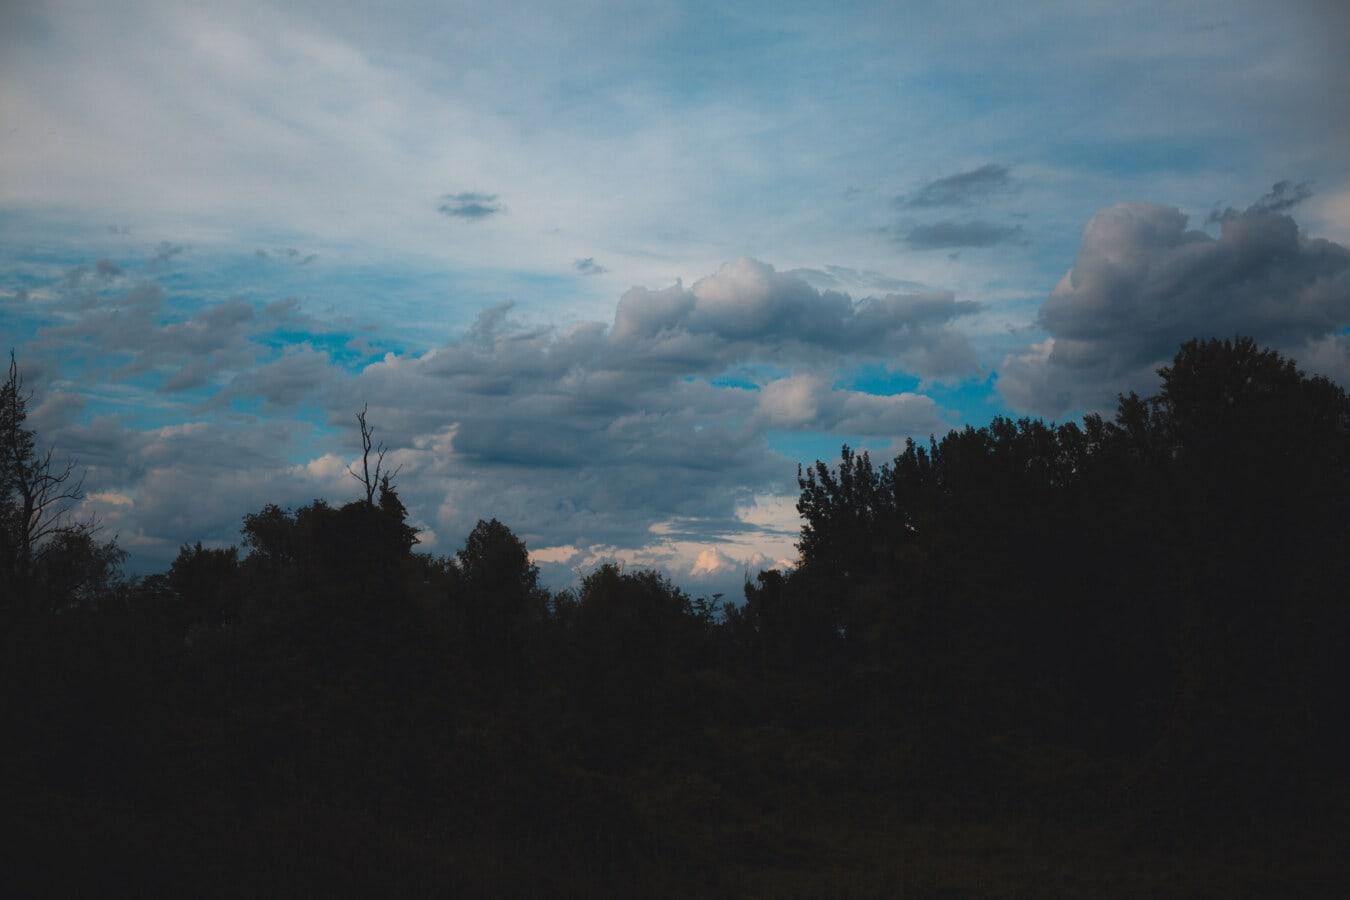 twilight, dusk, night, dark blue, clouds, forest, woodland, landscape, nature, sunset